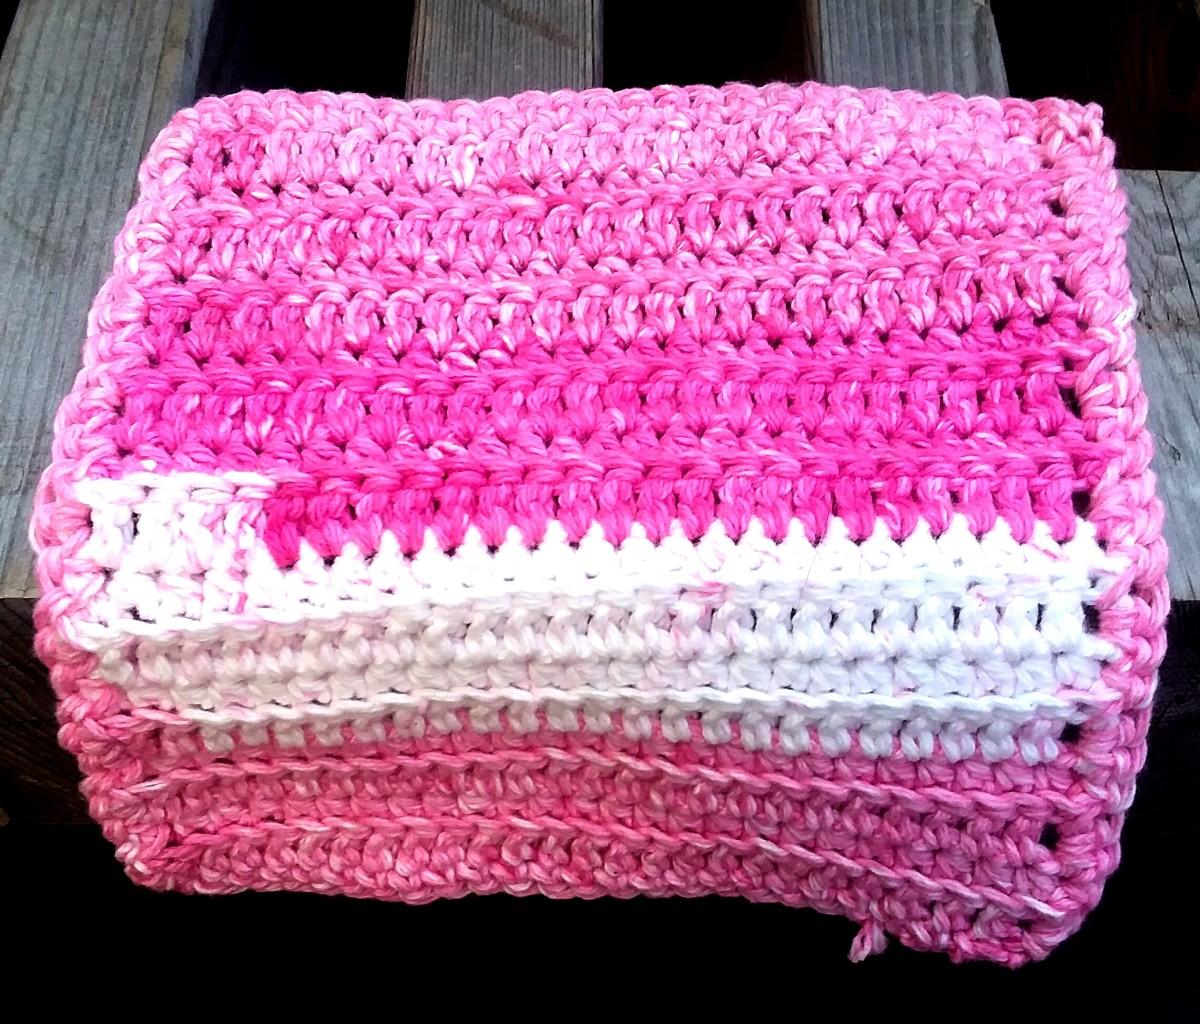 Ribbed Crochet Dishcloth Pattern Feltmagnet